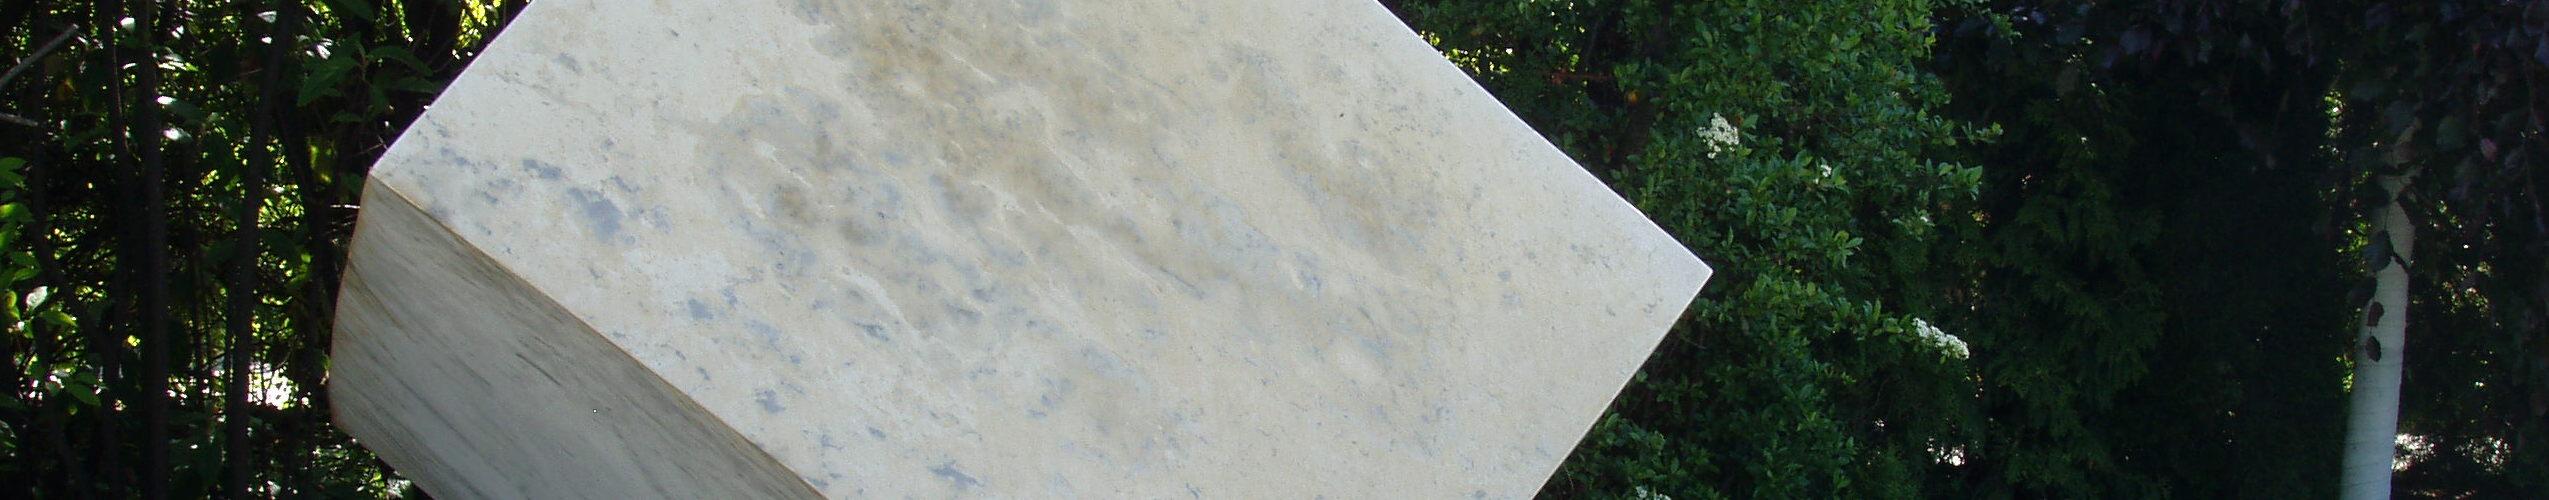 schoenberg.grave